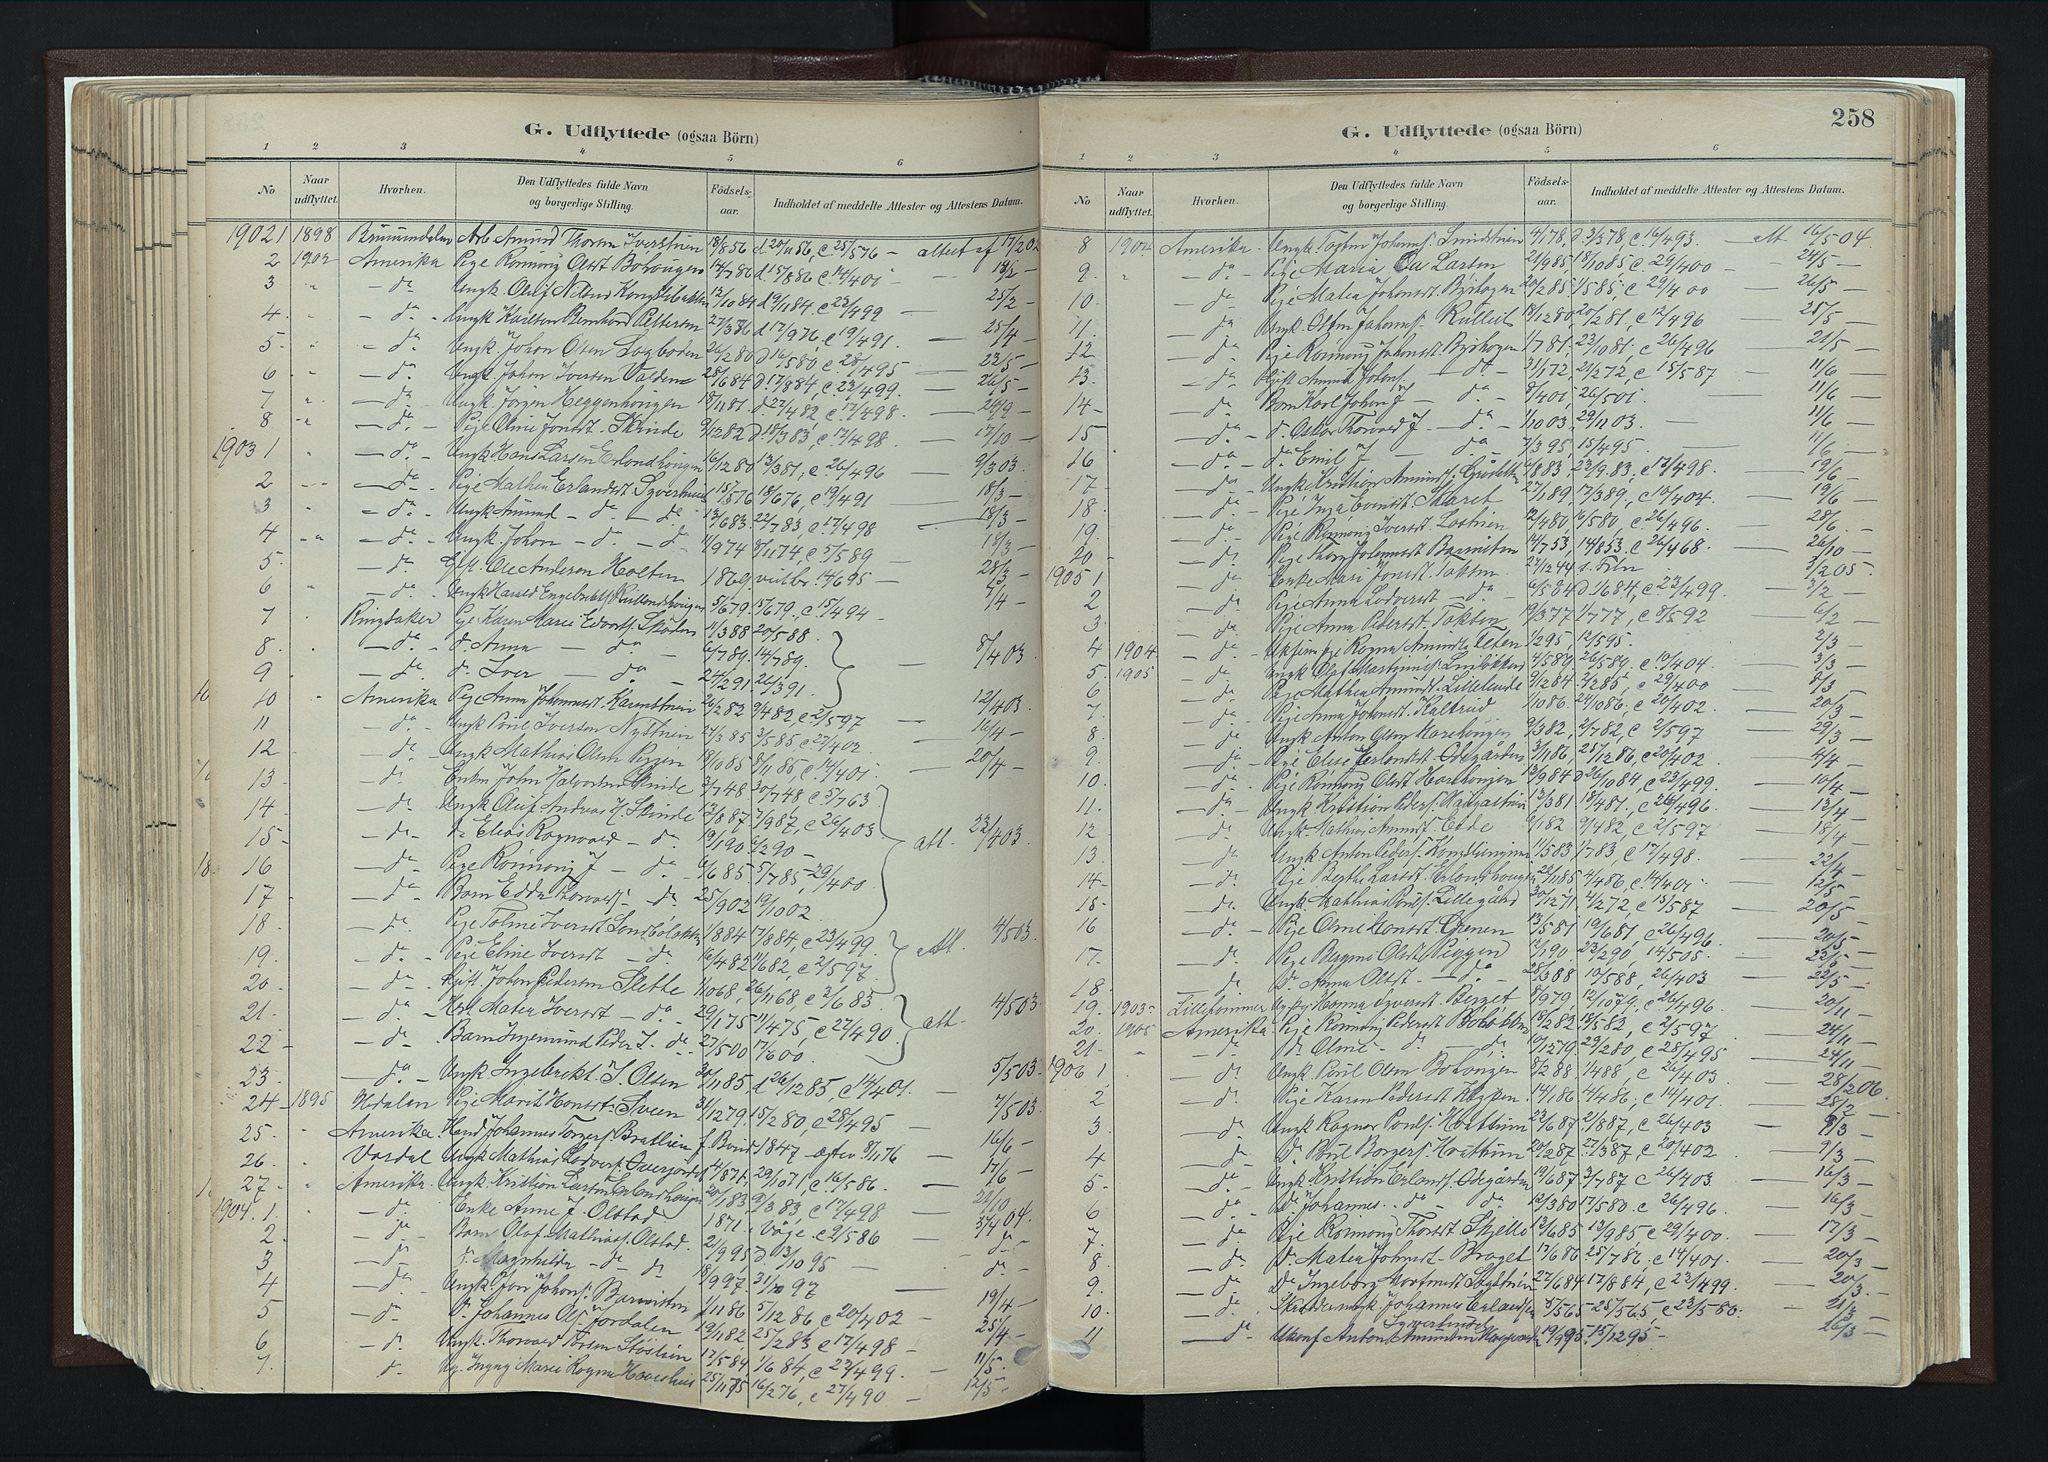 SAH, Nord-Fron prestekontor, Ministerialbok nr. 4, 1884-1914, s. 258